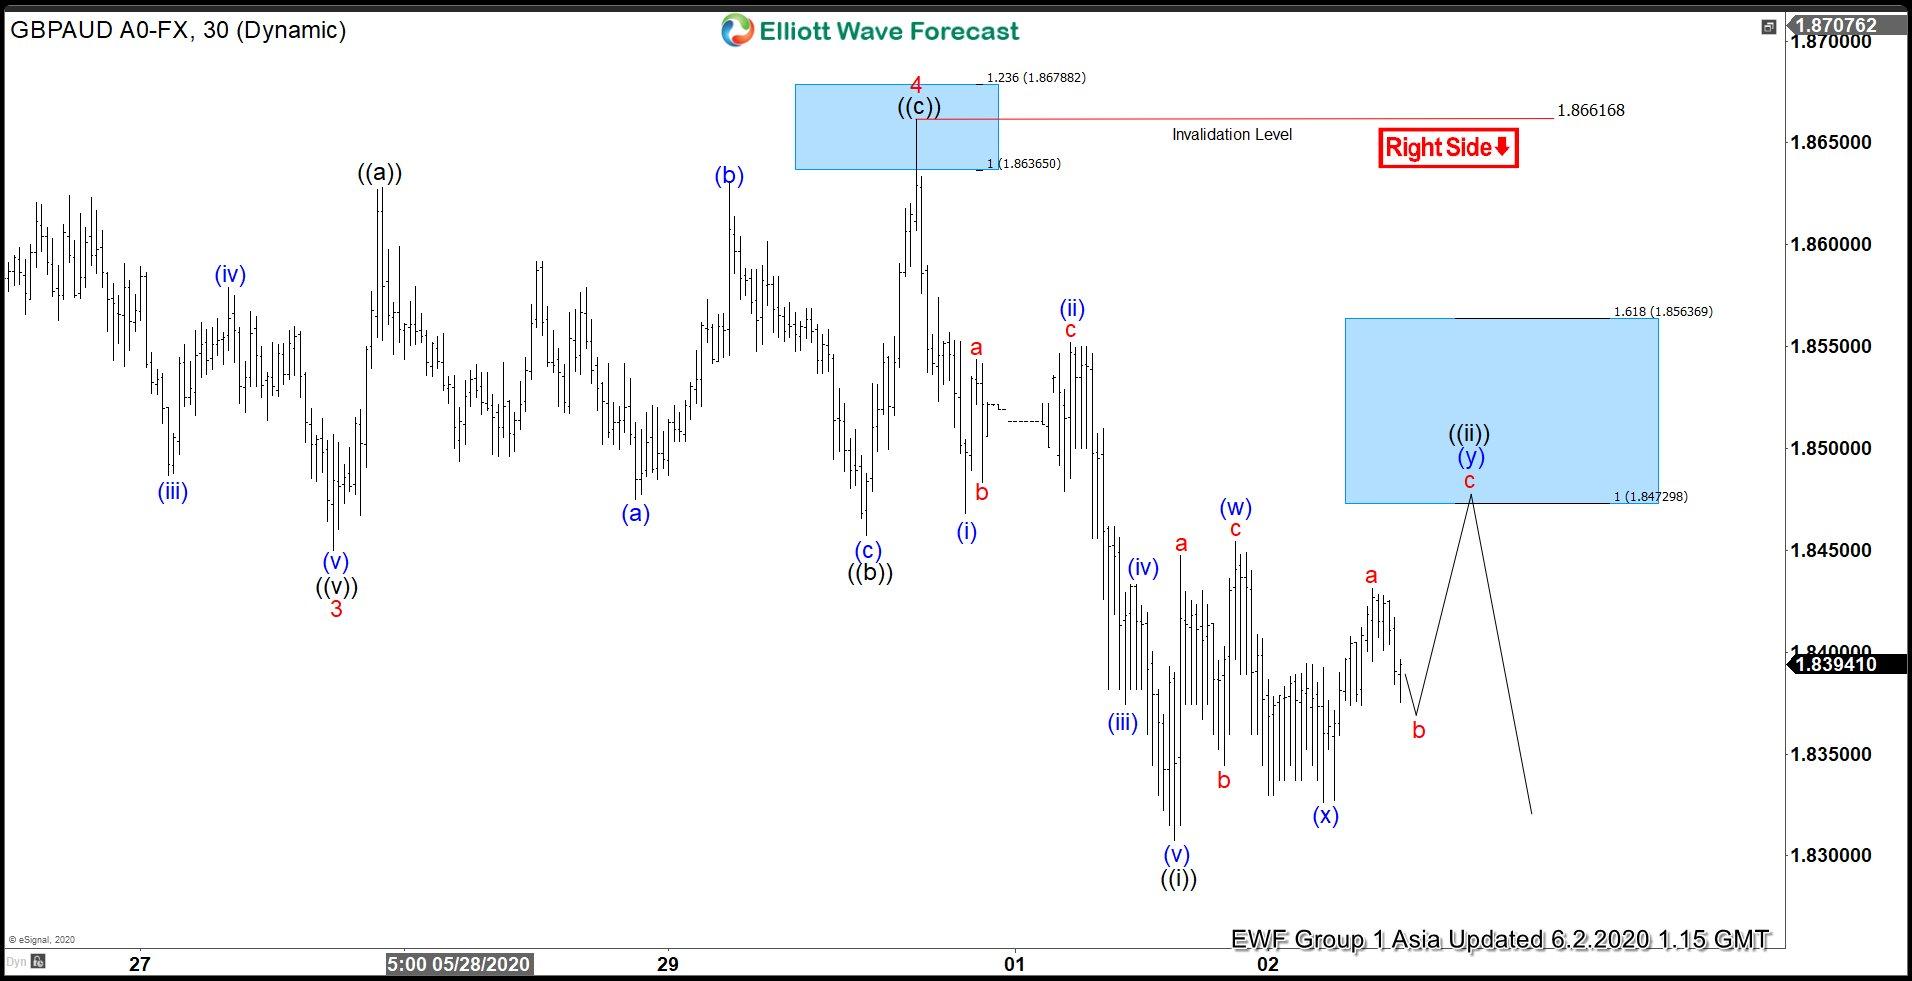 GBPAUD Elliott Wave Chart 2 June 2020